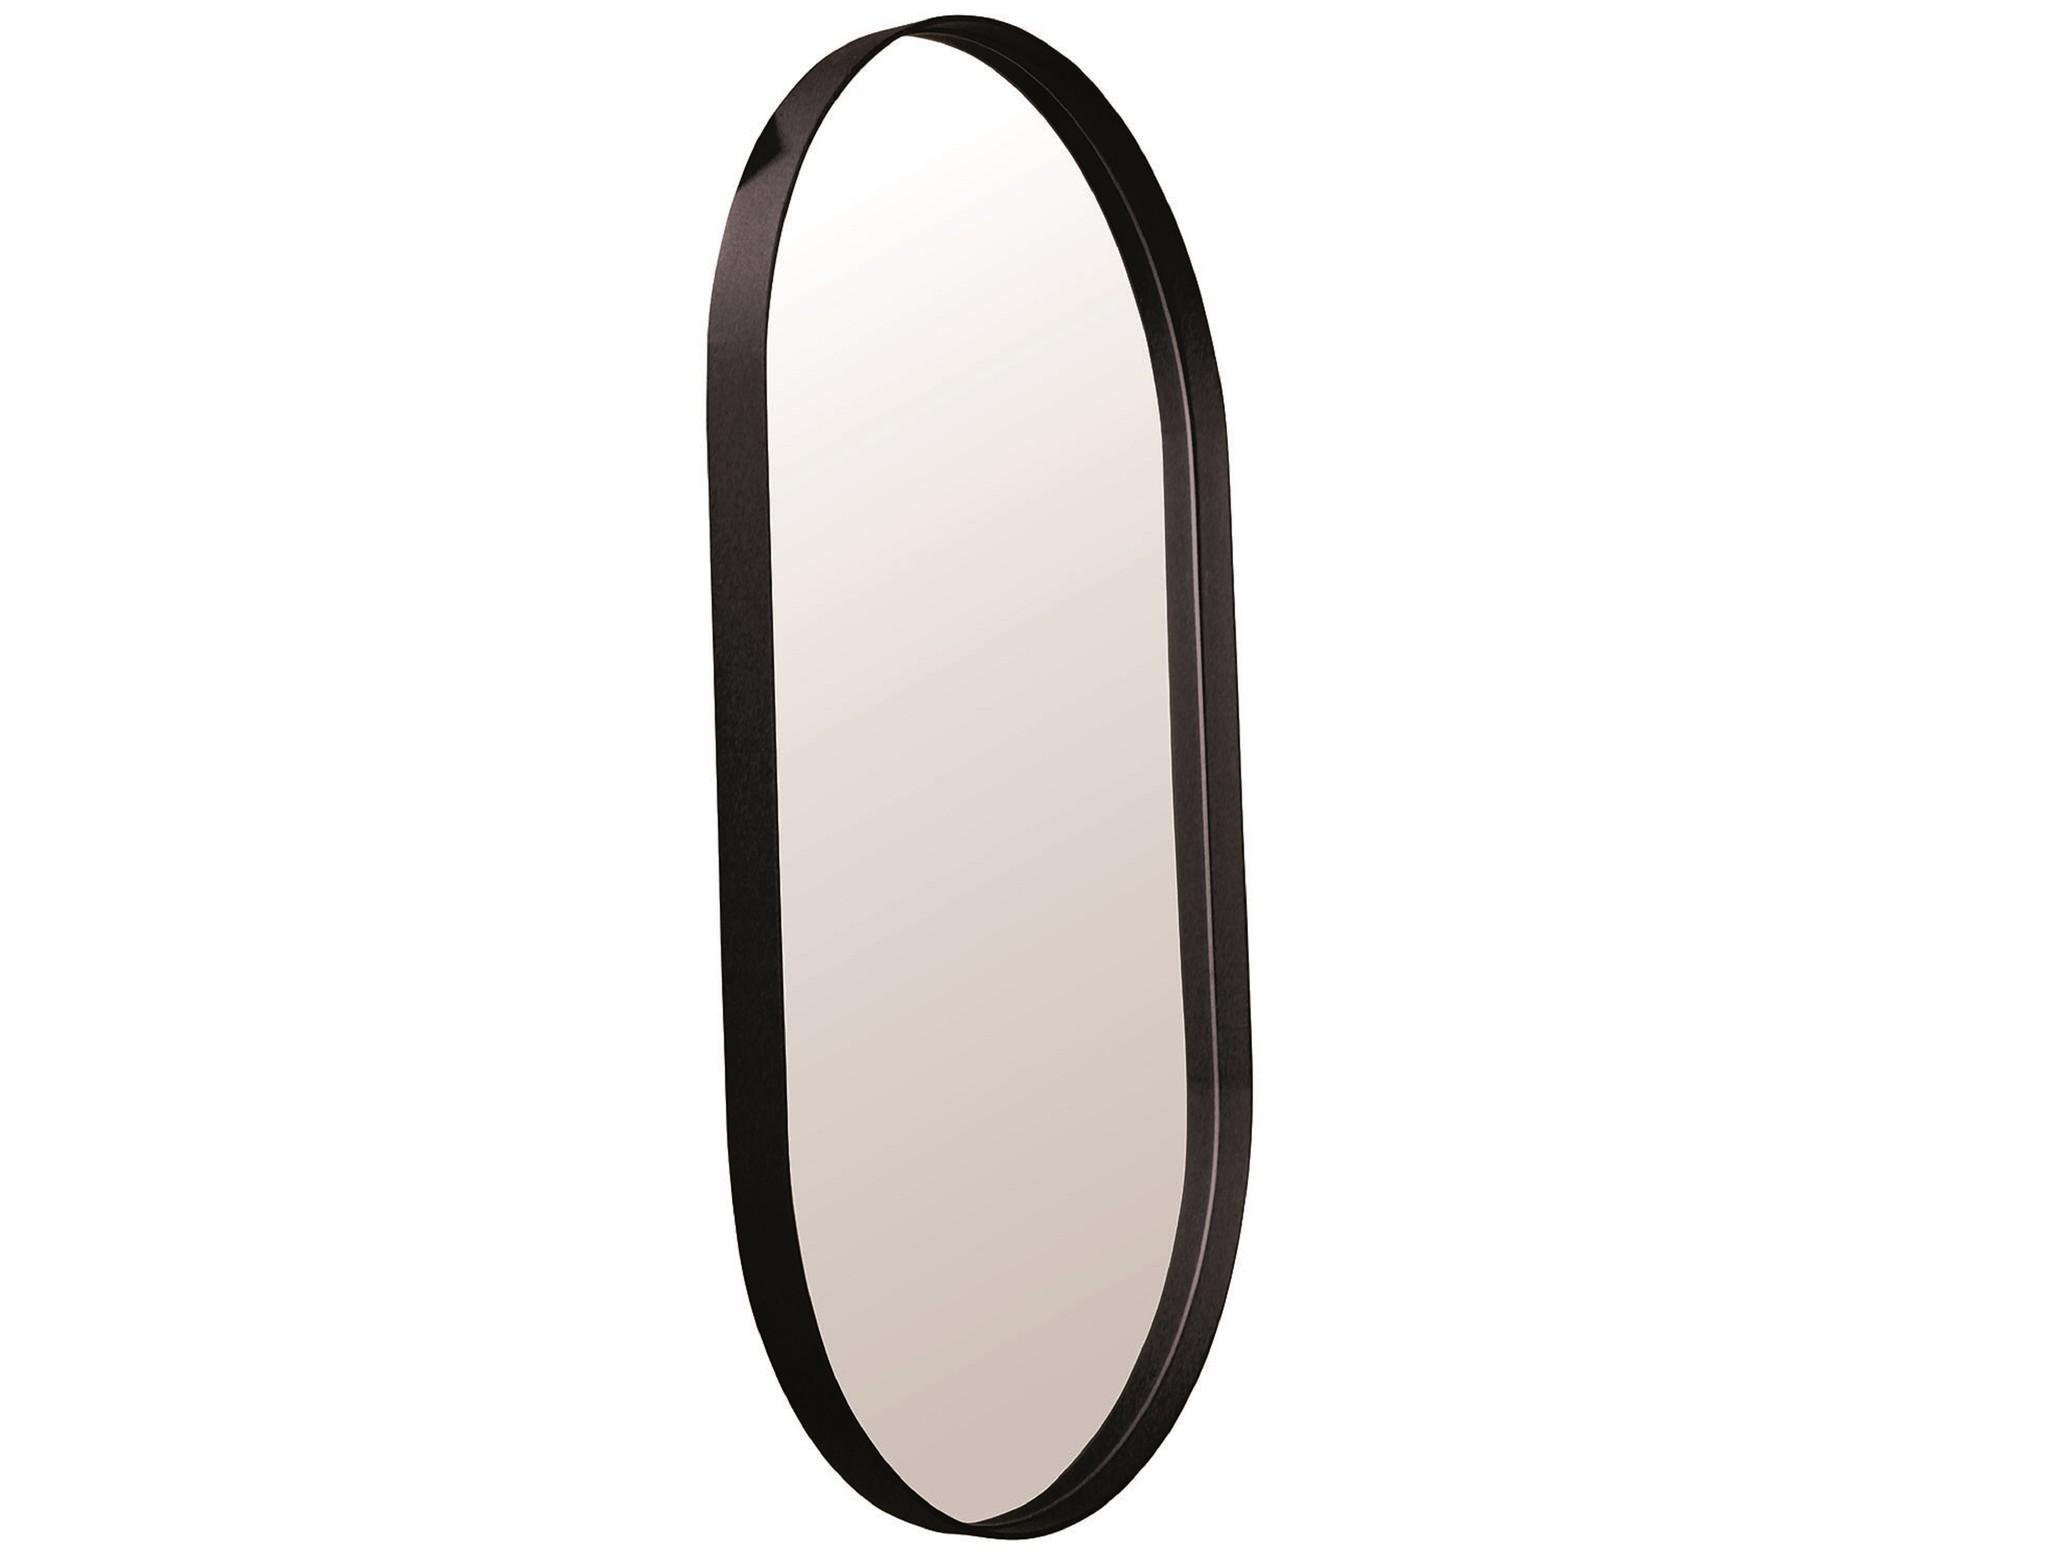 Настенное зеркало ванда 90*40 (simple mirror) черный 40.0x90.0x4.0 см.